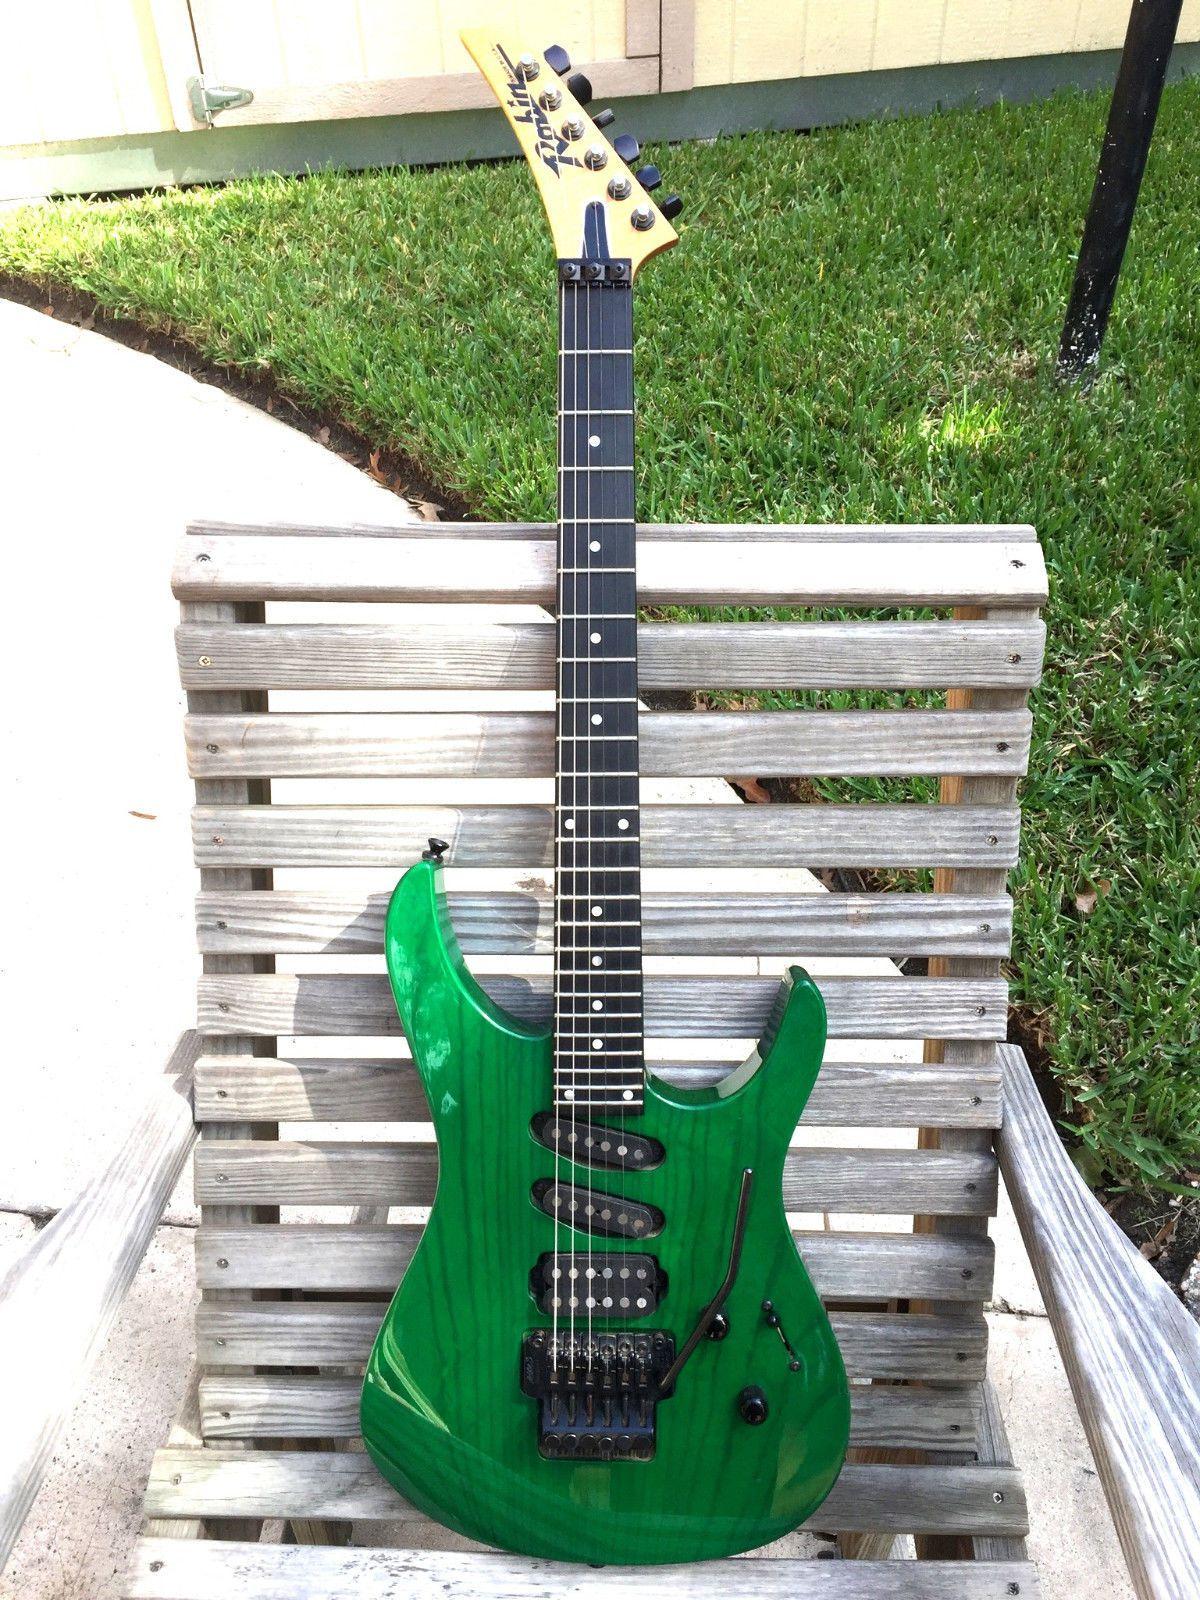 1995 robin medley usa guitar with kahler locking tremolo and rio grande pickups ebay guitar. Black Bedroom Furniture Sets. Home Design Ideas